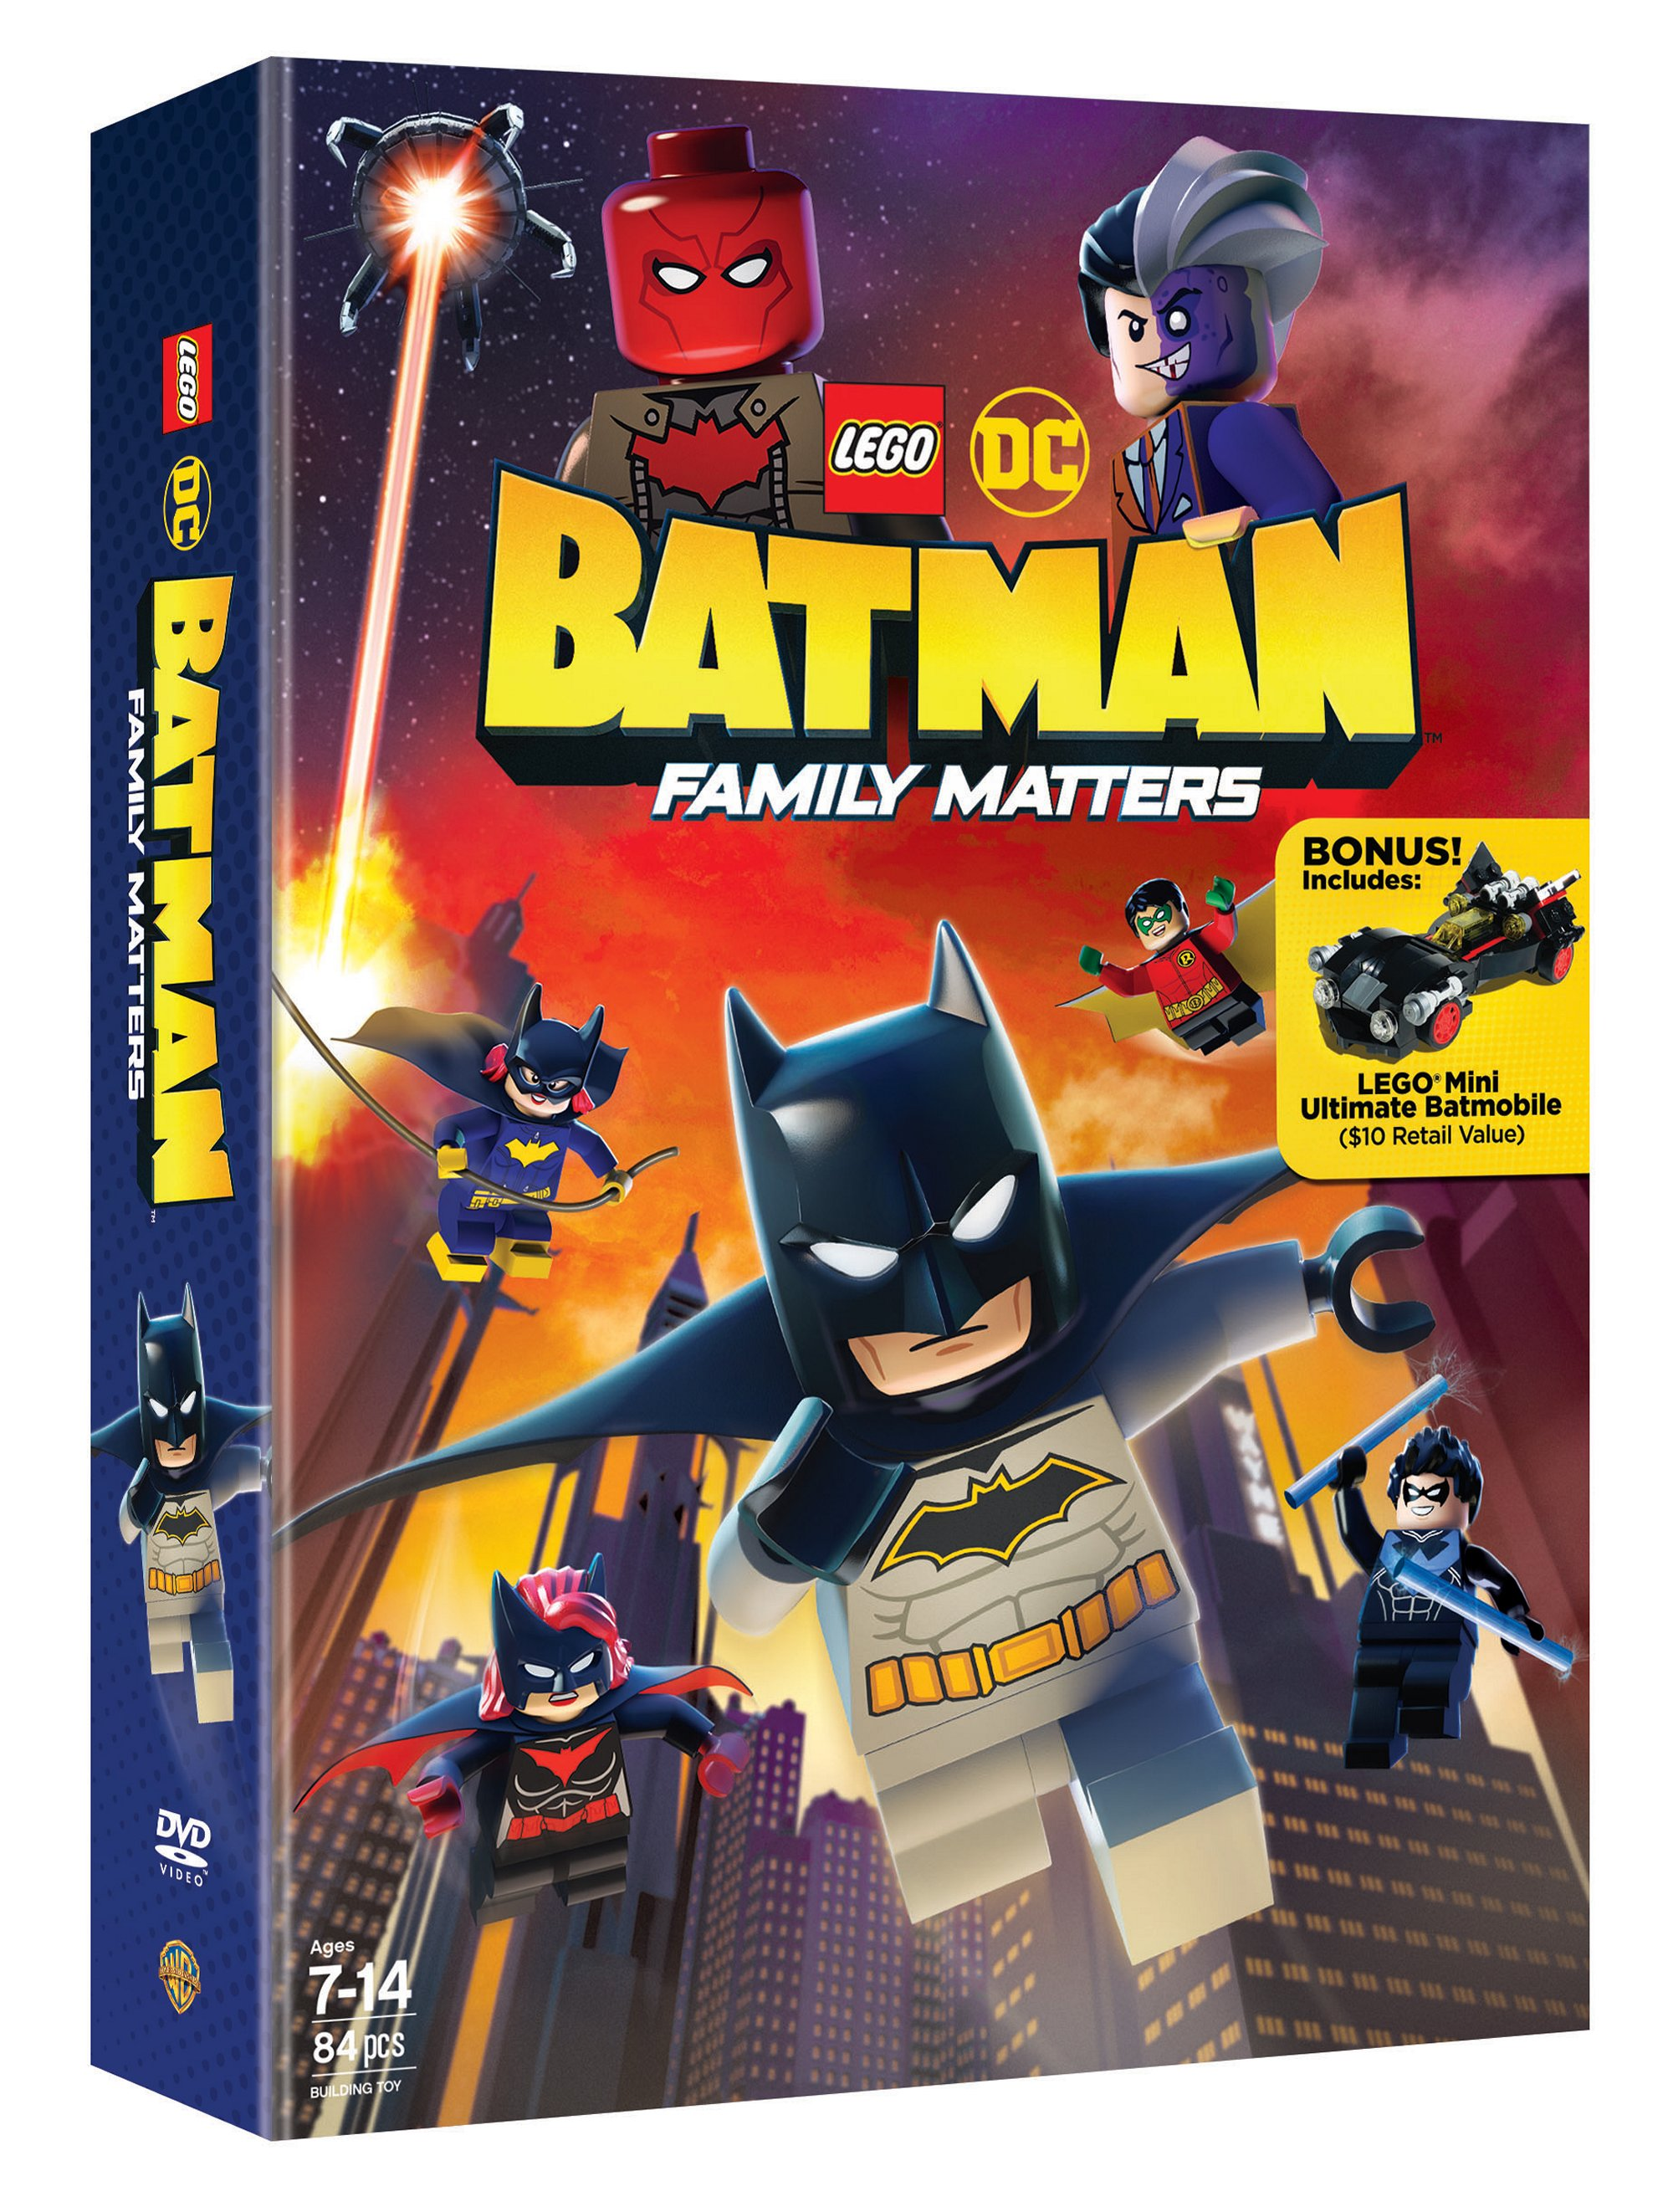 LEGO DC Batman Family Matters DVD 3D.JPEG